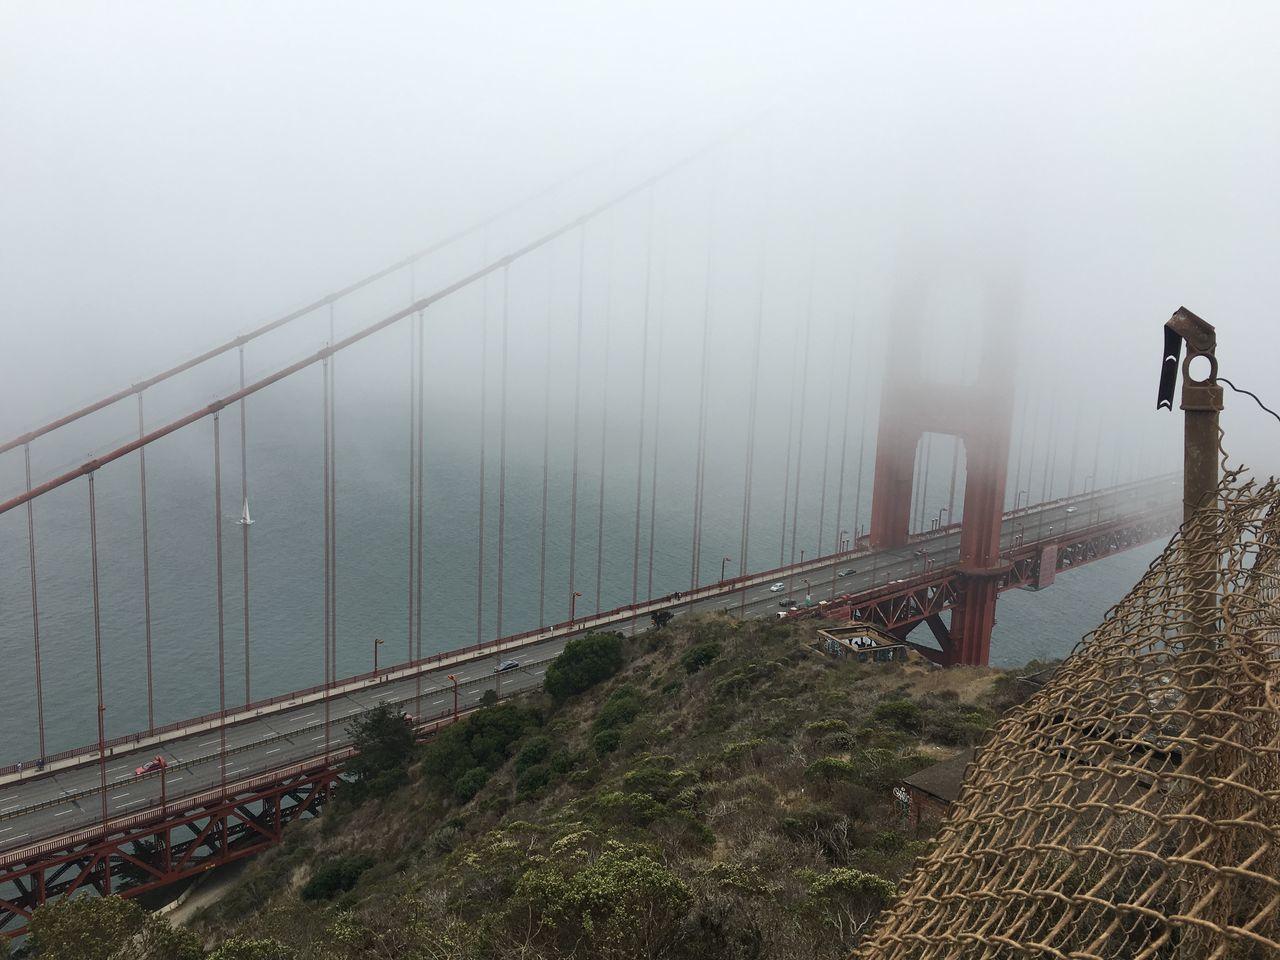 The Golden Gate Bridge Golden Gate Bridge San Francisco Bay Area California Fog Summer Battery Spencer